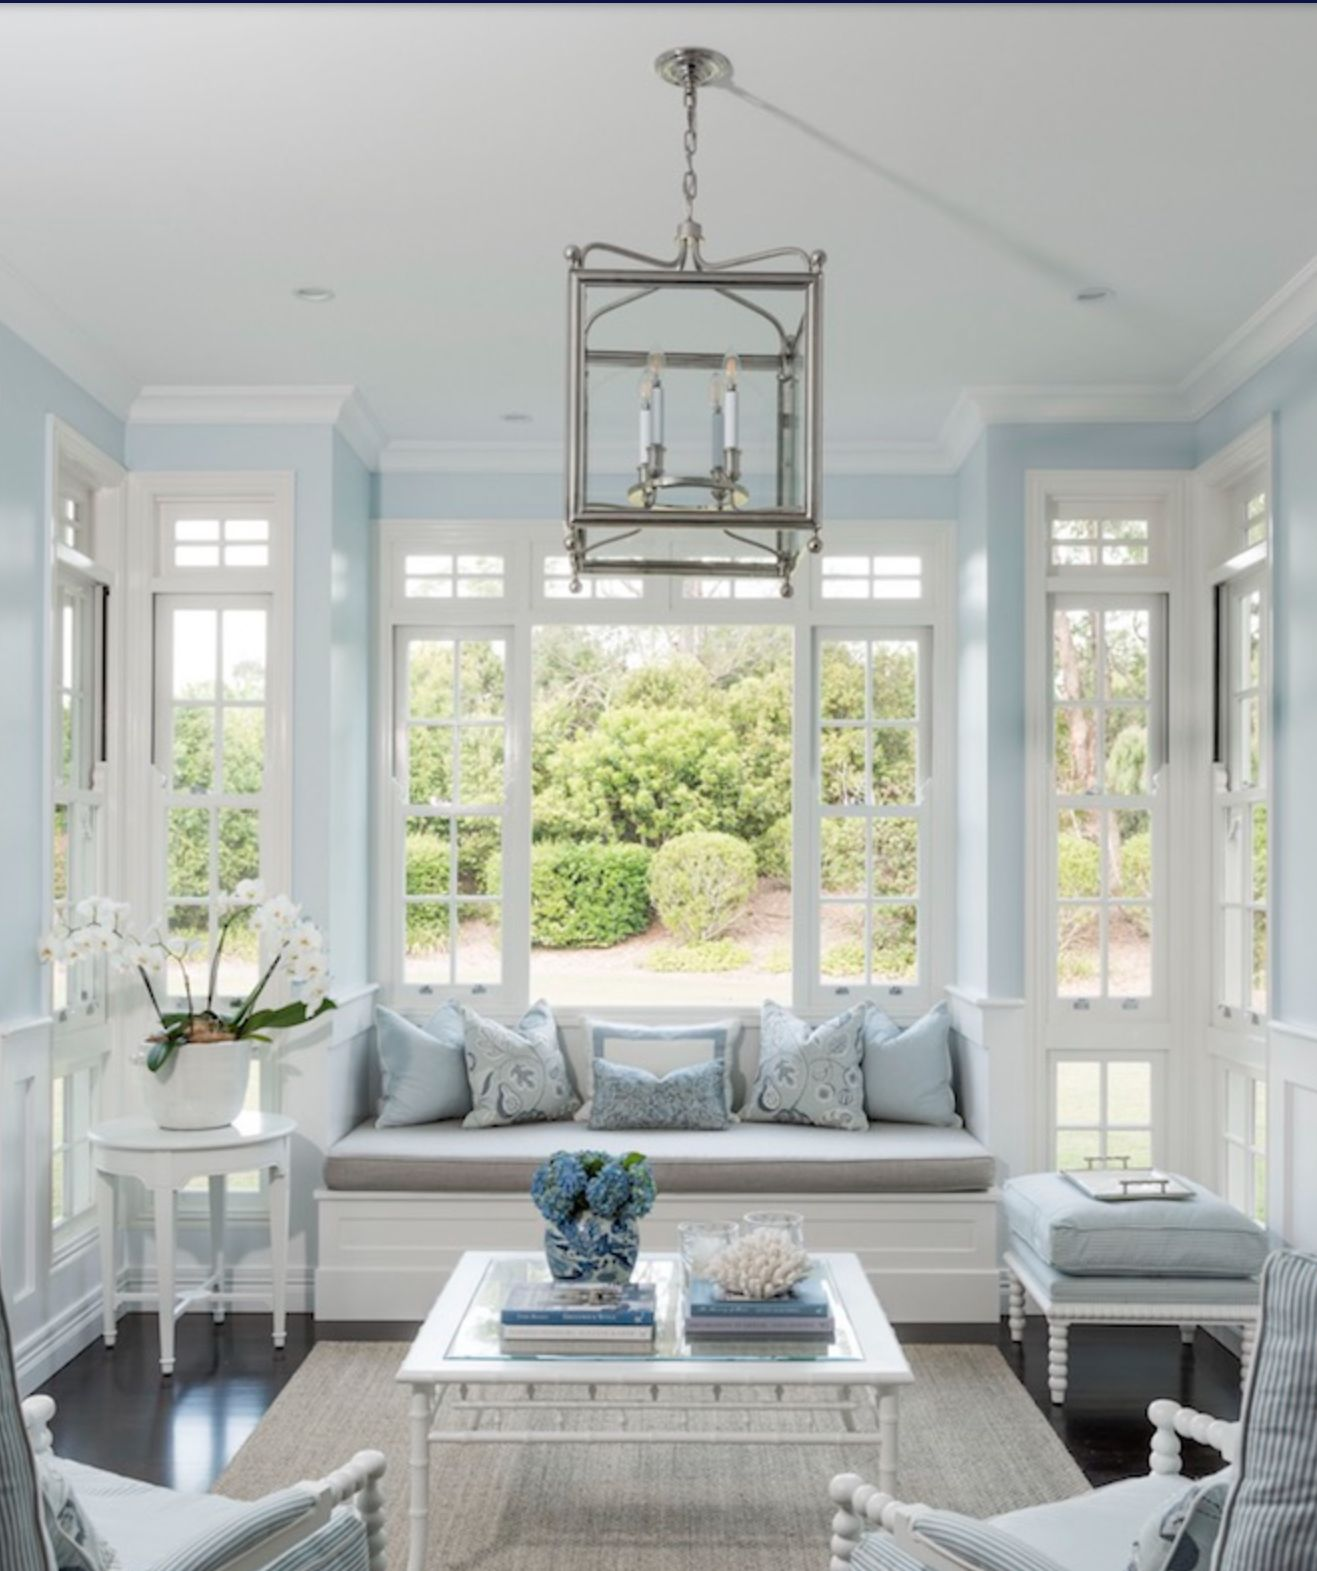 Interior Sunroom Addition Ideas: Pin By Lindatmorgan On Decor In 2020